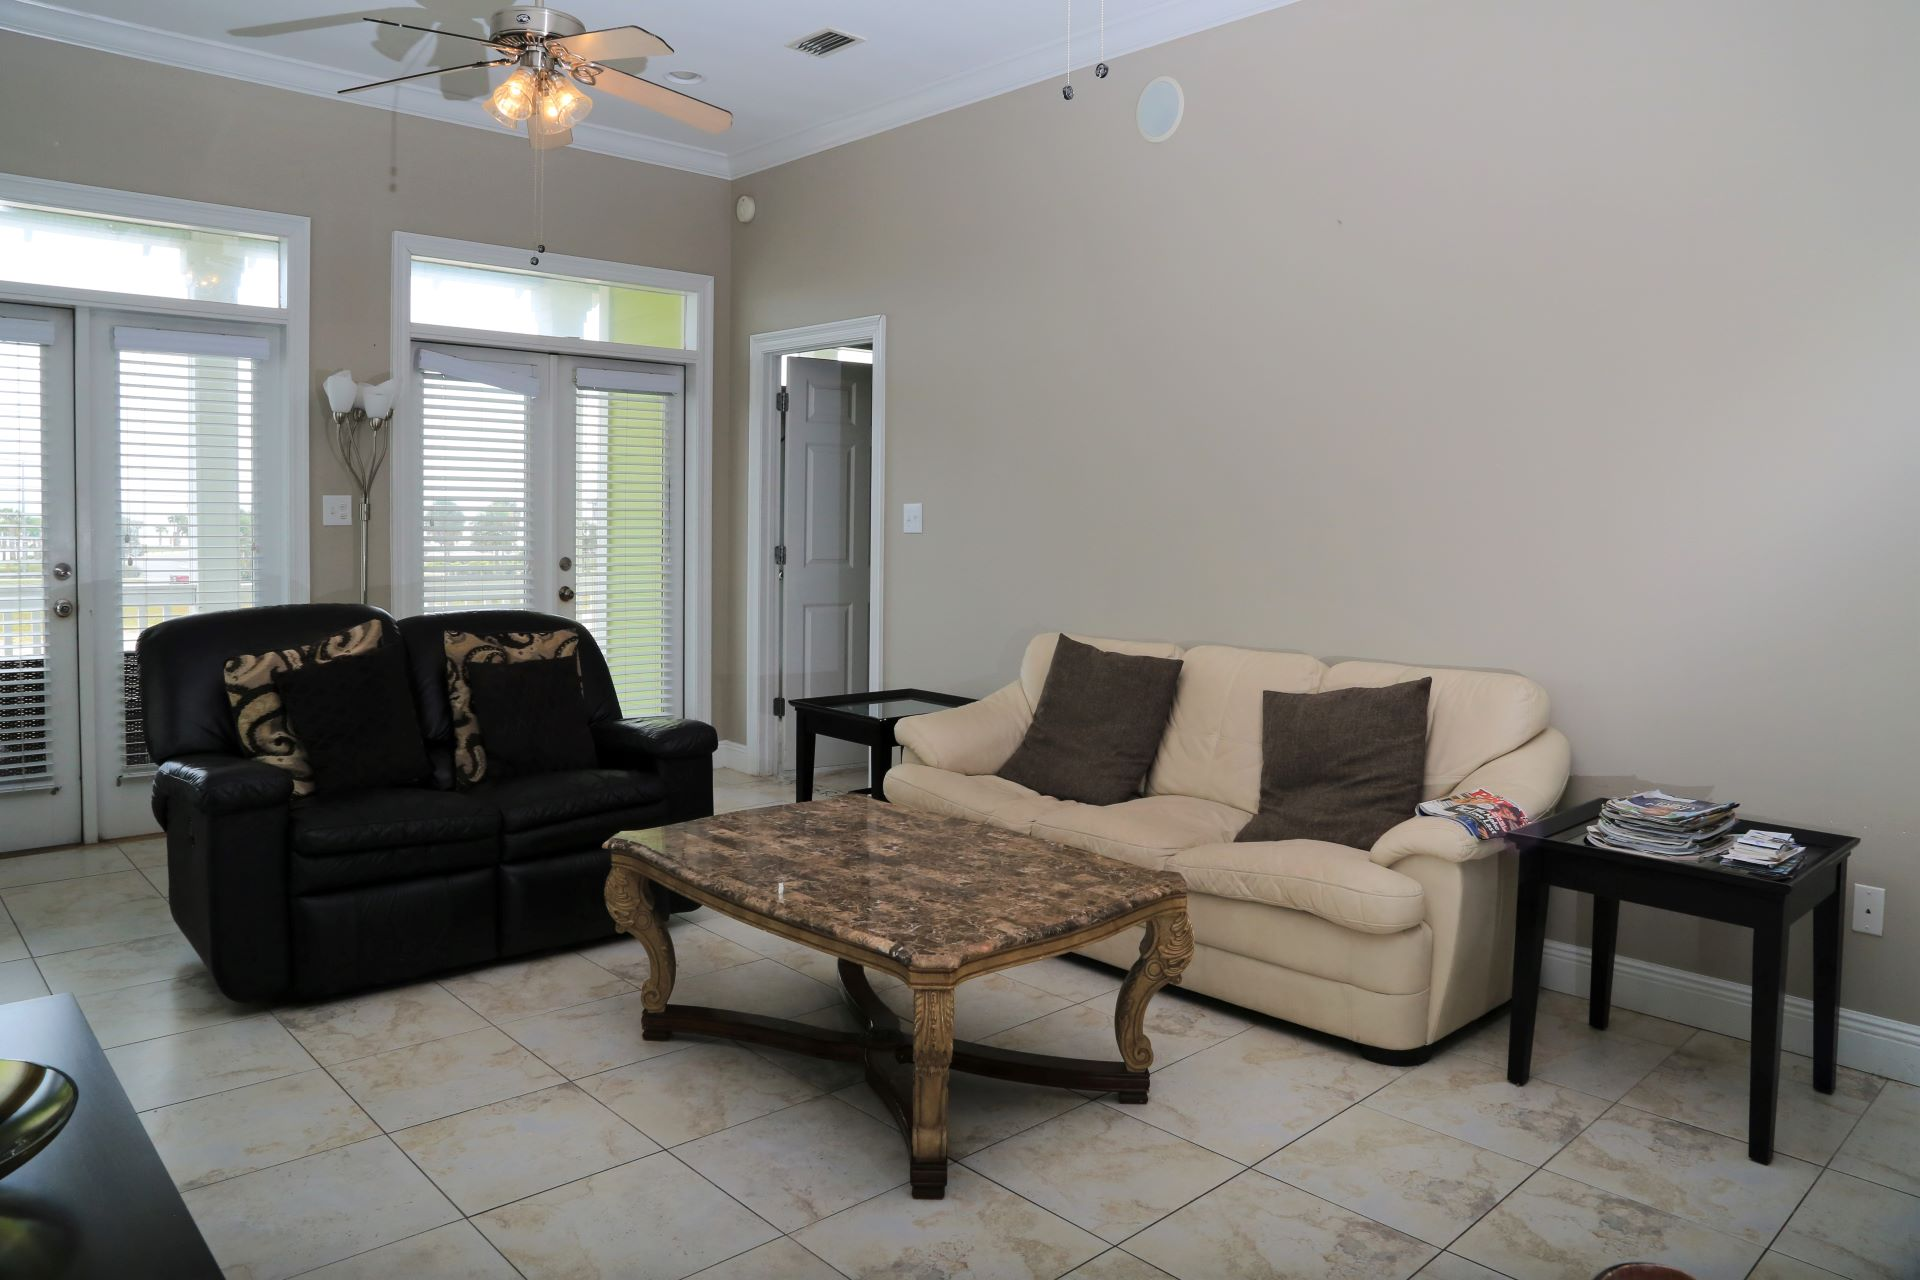 Spacious living room with sleeper sofa.